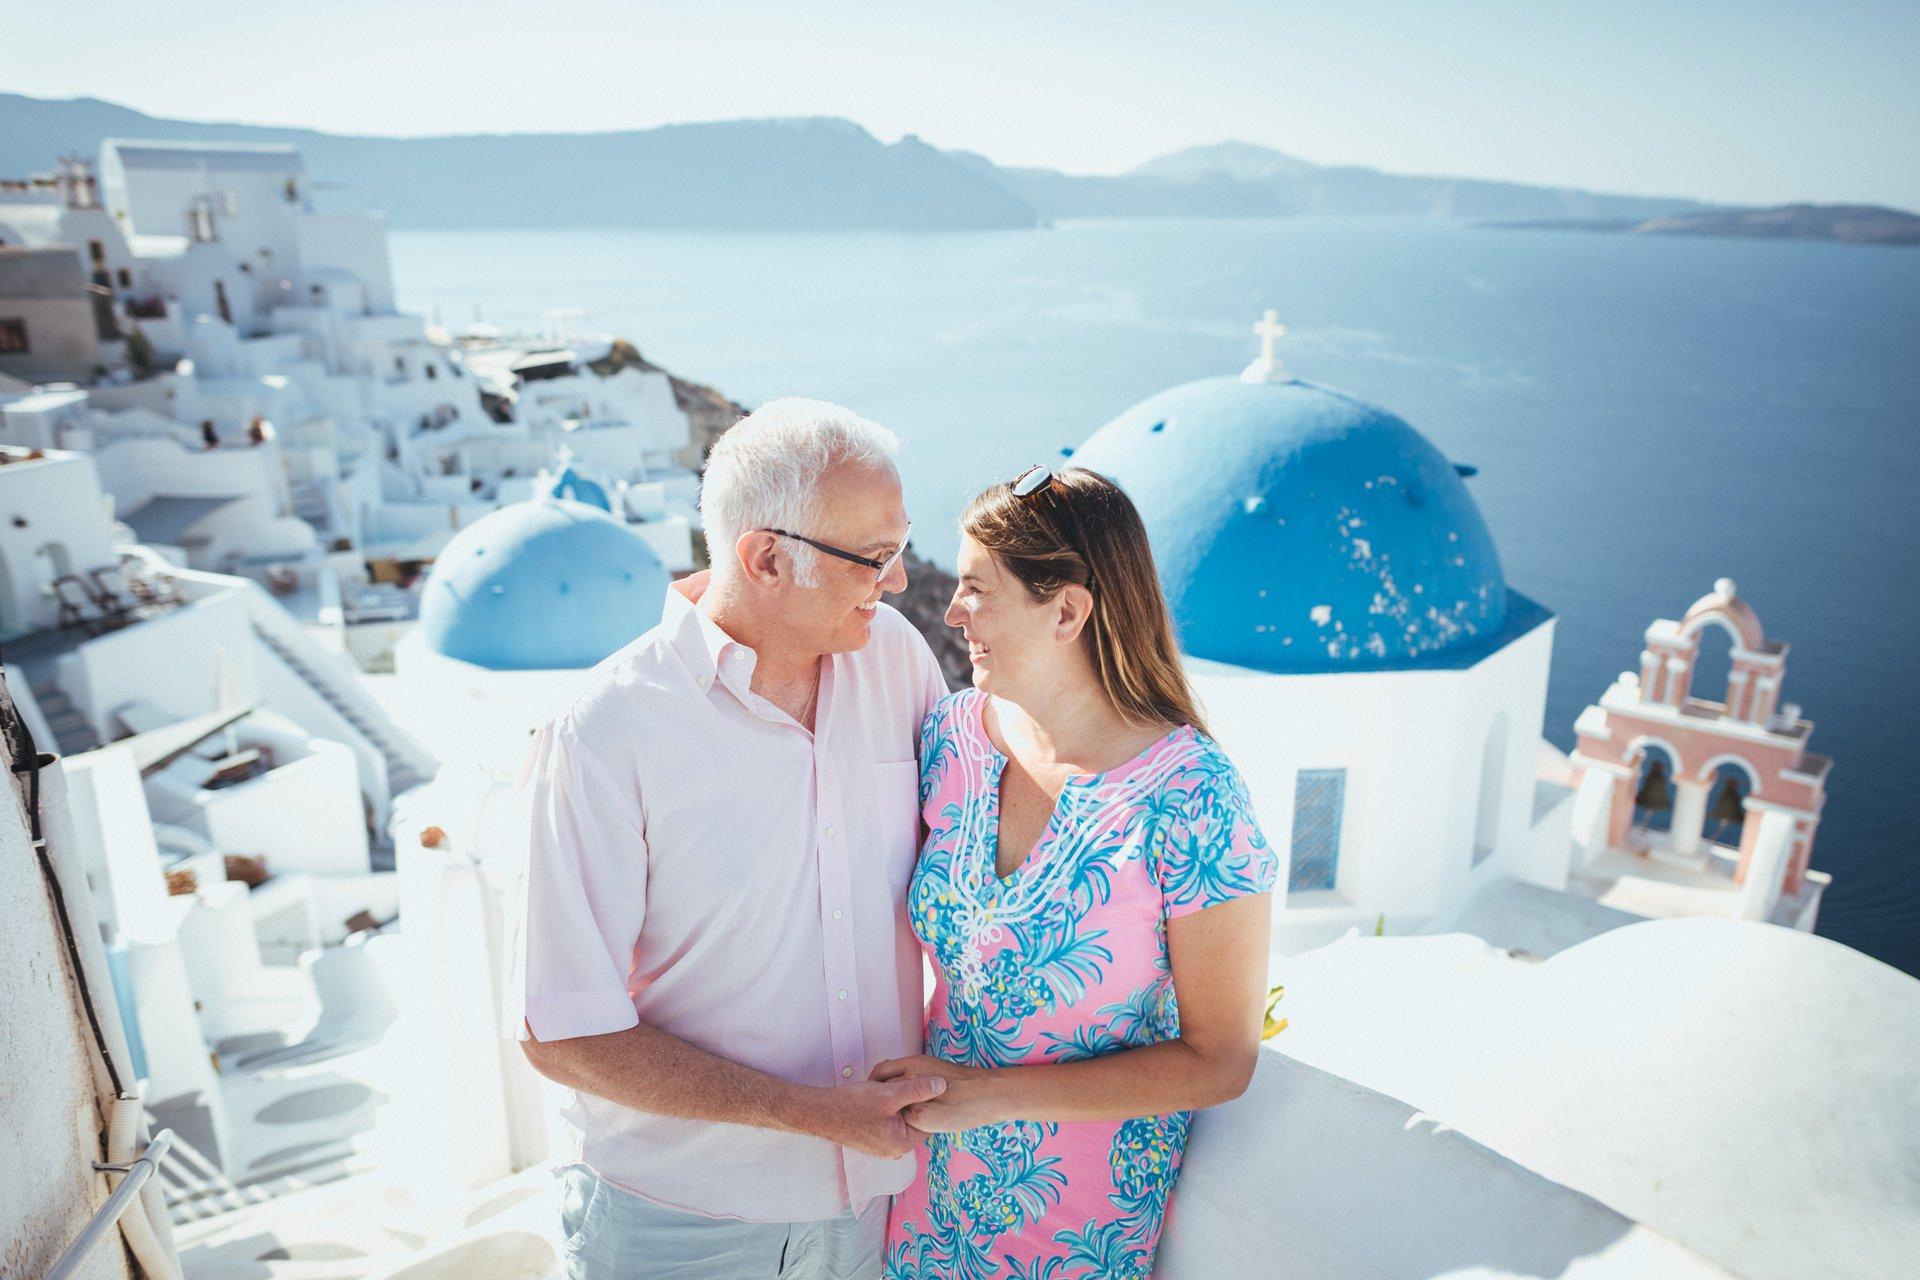 Flytographer Travel Story - Santorini Anniversary Trip